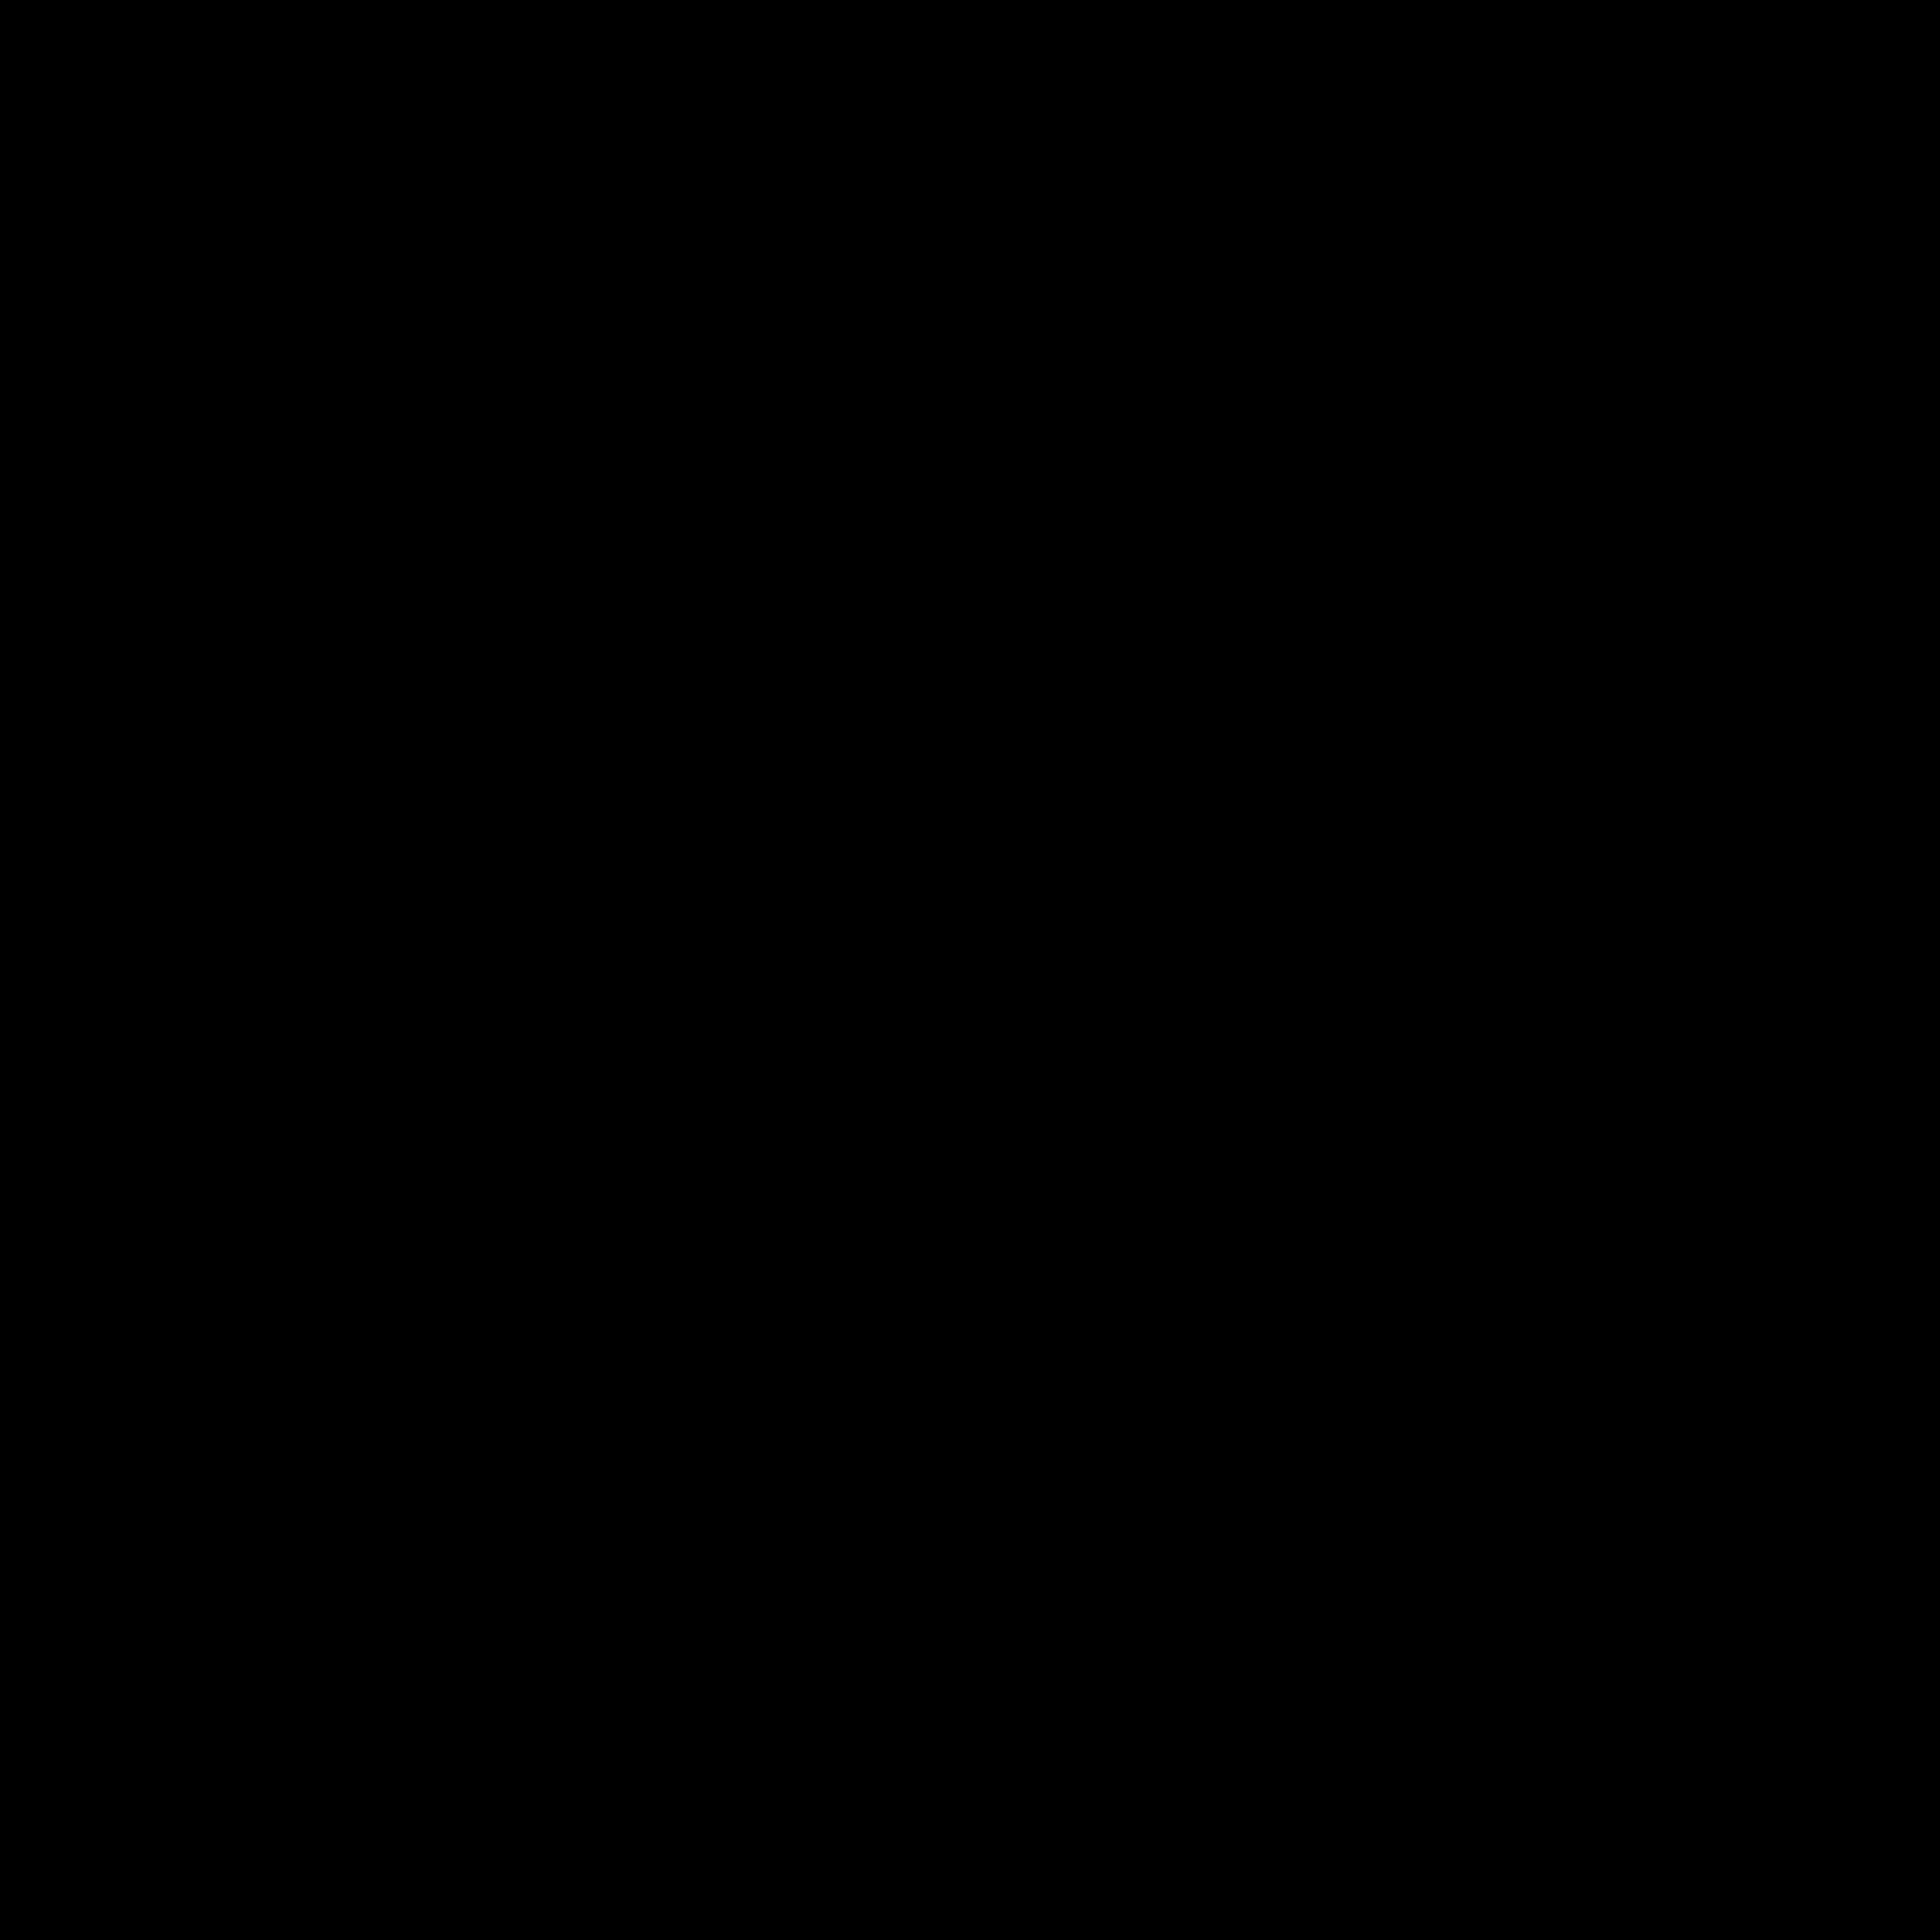 File gear noun project. Gears clipart engineering symbol